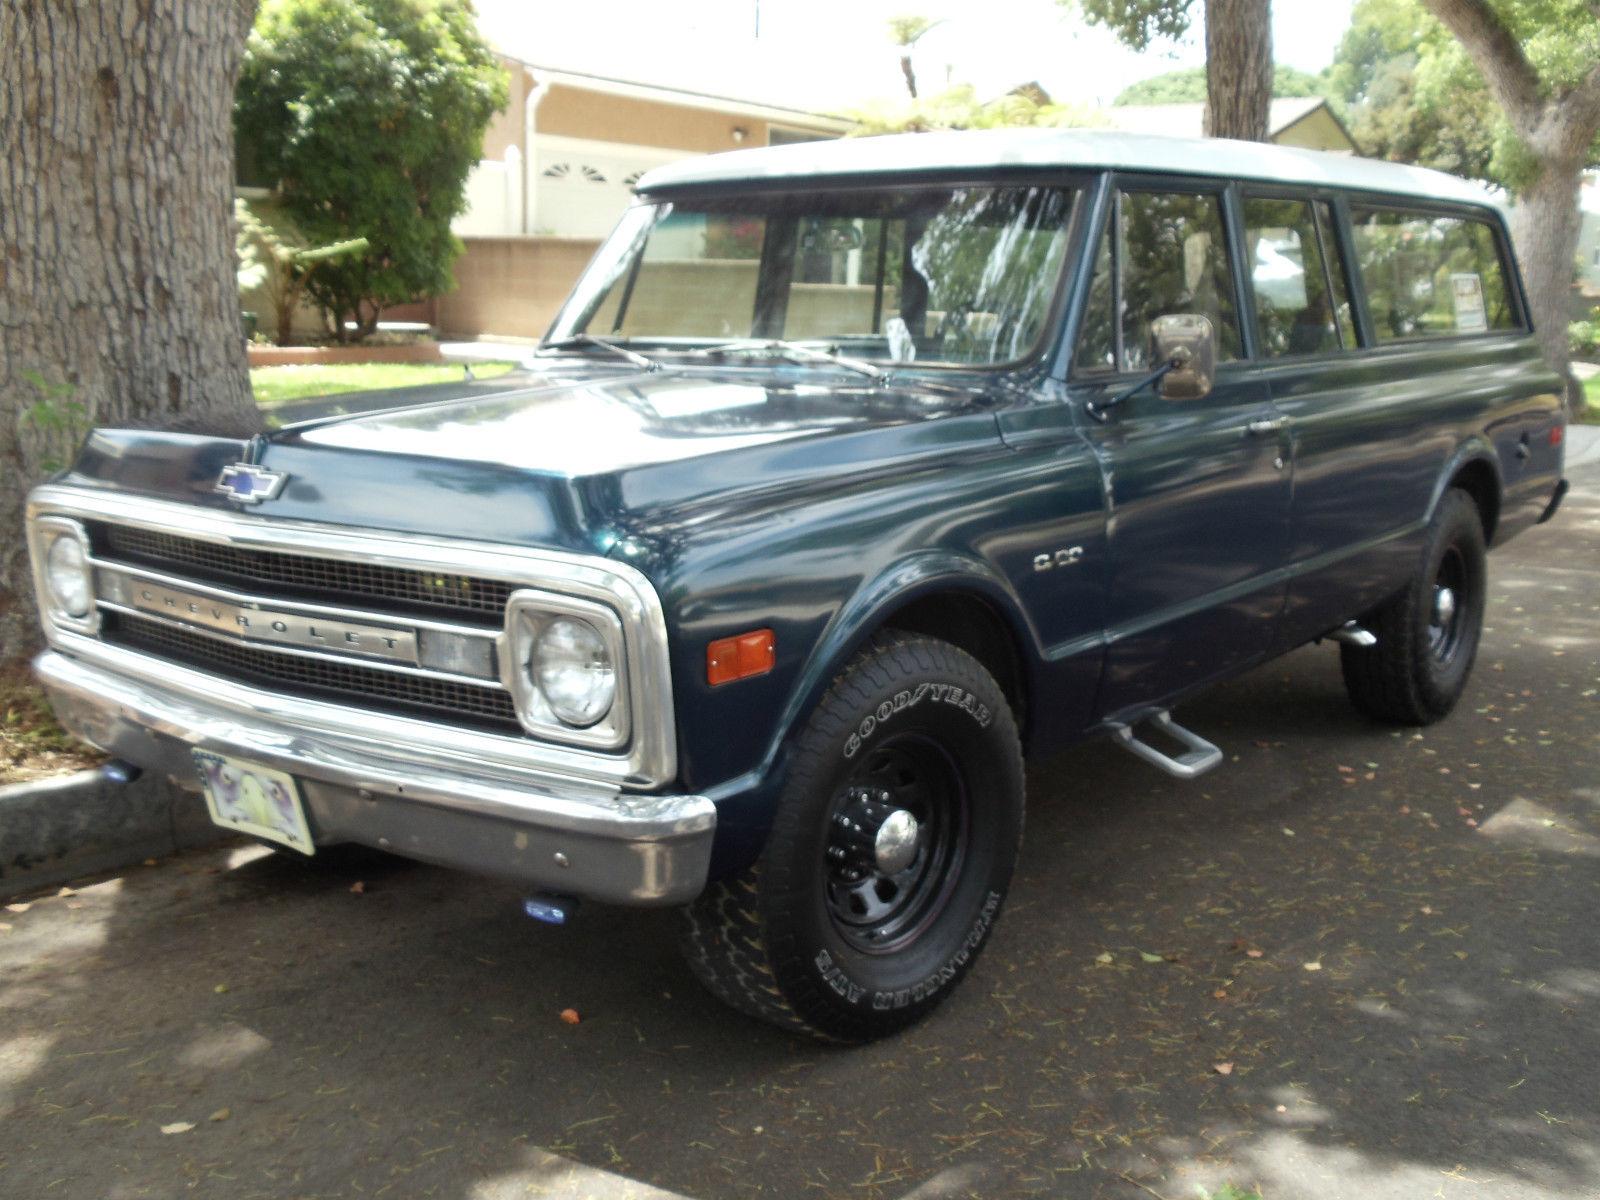 Rare 3 Door Classic Truck 1970 Suburban Chevy Truck